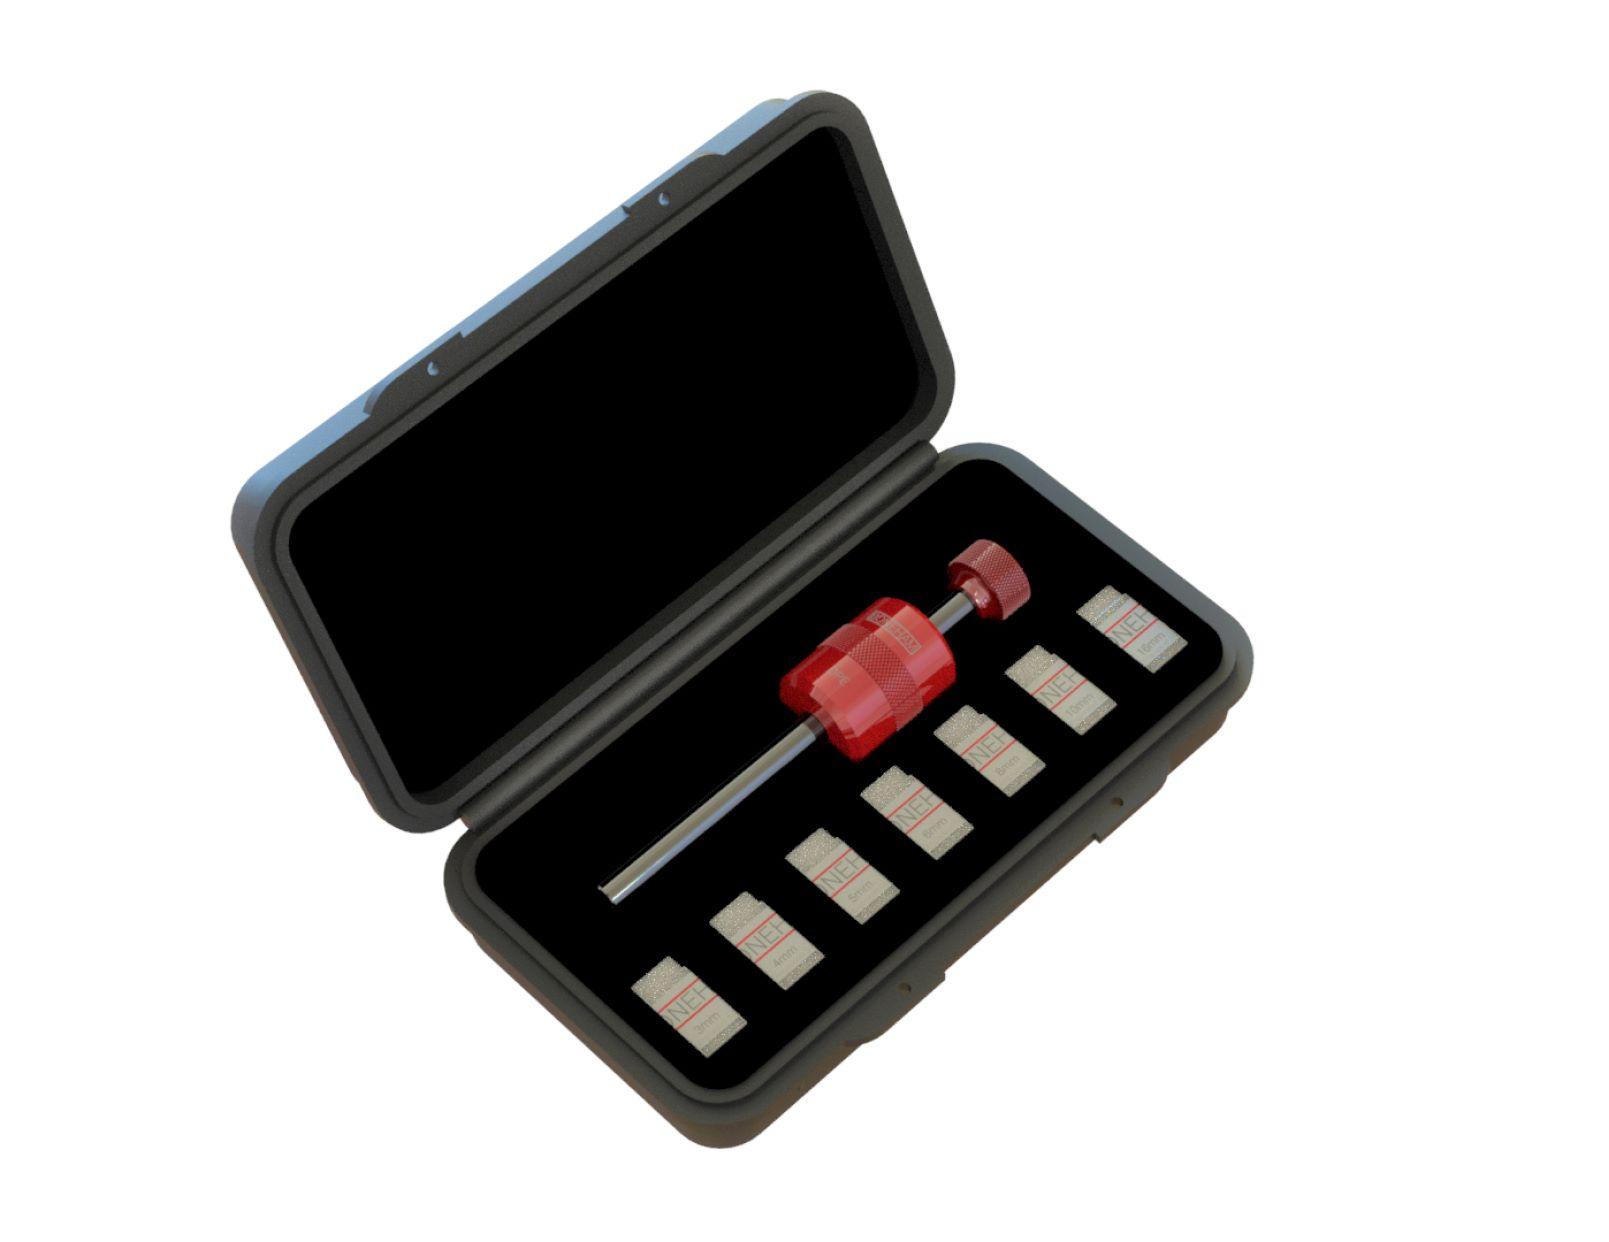 Dowel Pin Puller Kit Boneham Usa The Home Of Drill